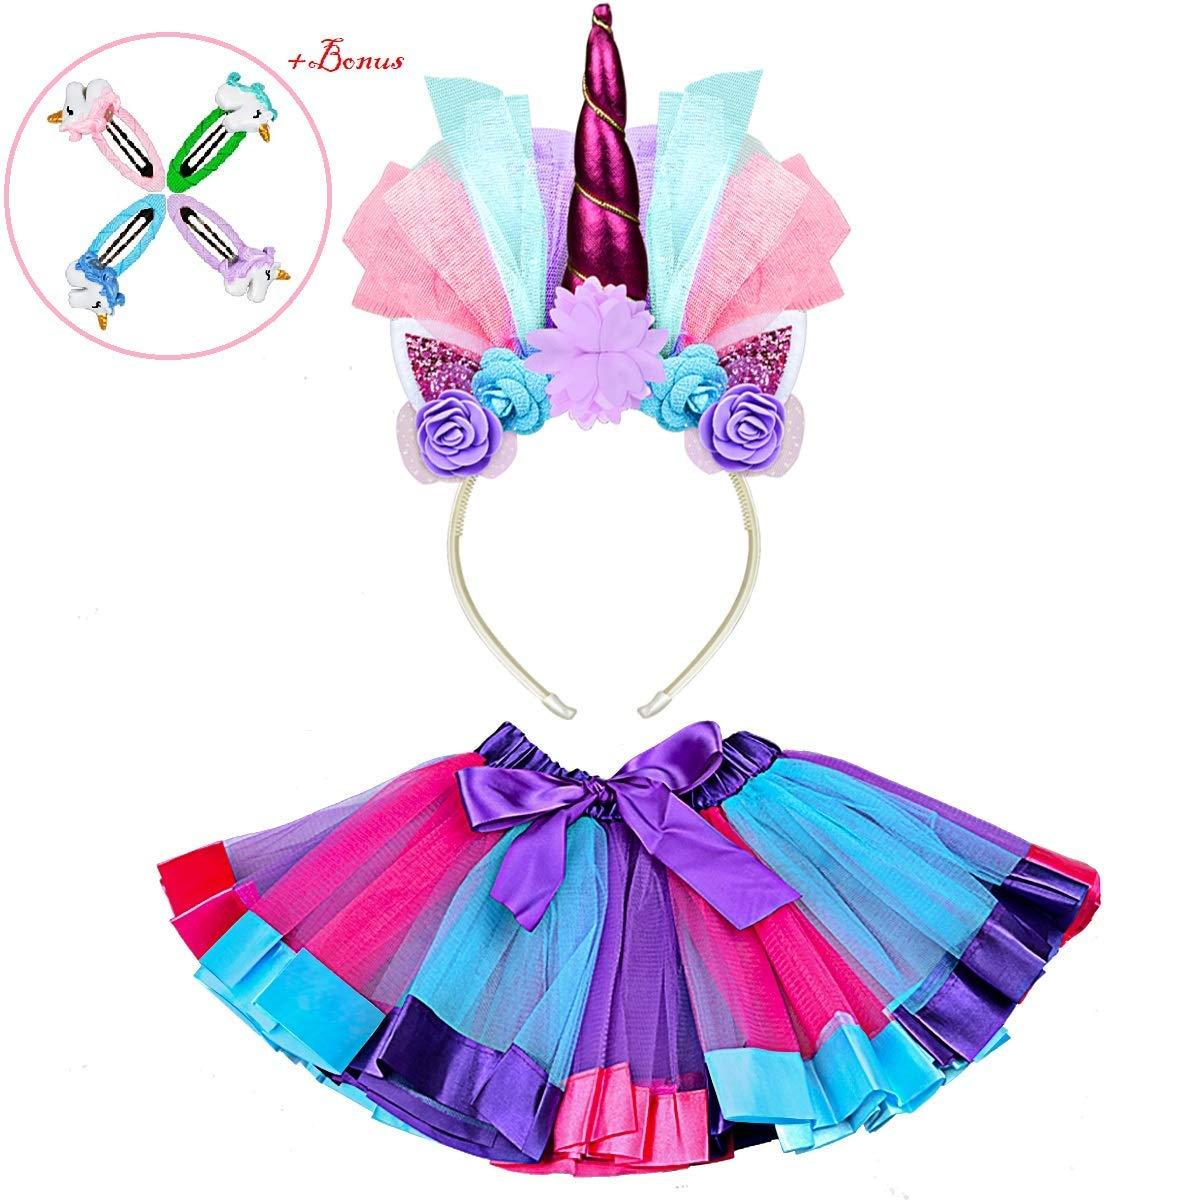 4627e7be372b Get Quotations · Tutu Dress with Unicorn Headband, Rainbow Mini Tutu Dress  with Elastic Waist